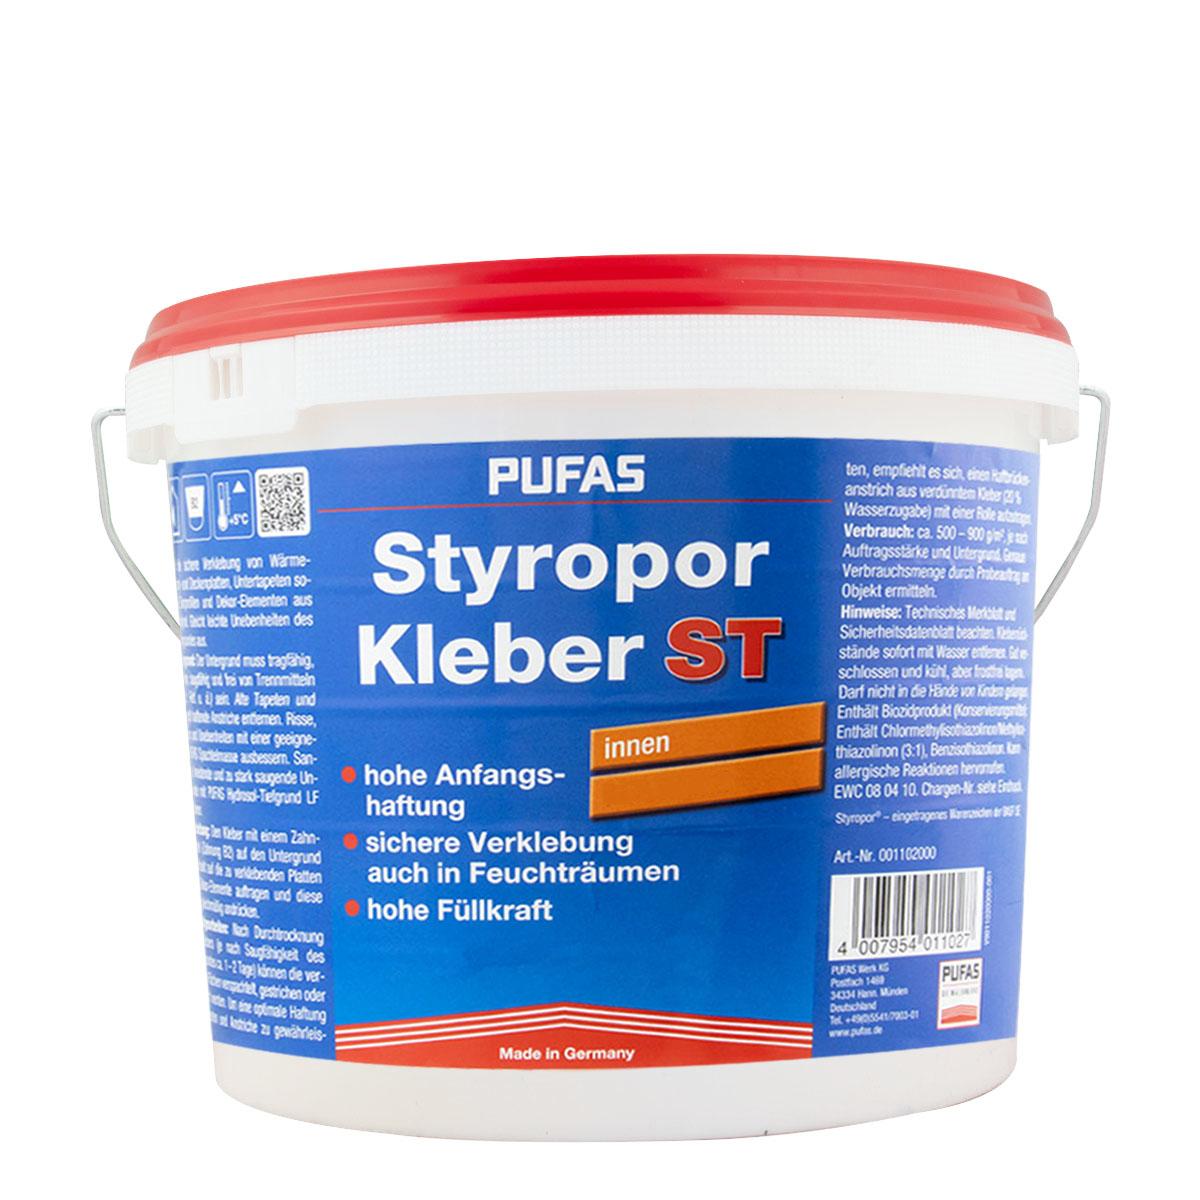 Pufas Styroporkleber 14Kg, Gebrauchsfertiger Dispersionsklebstoff